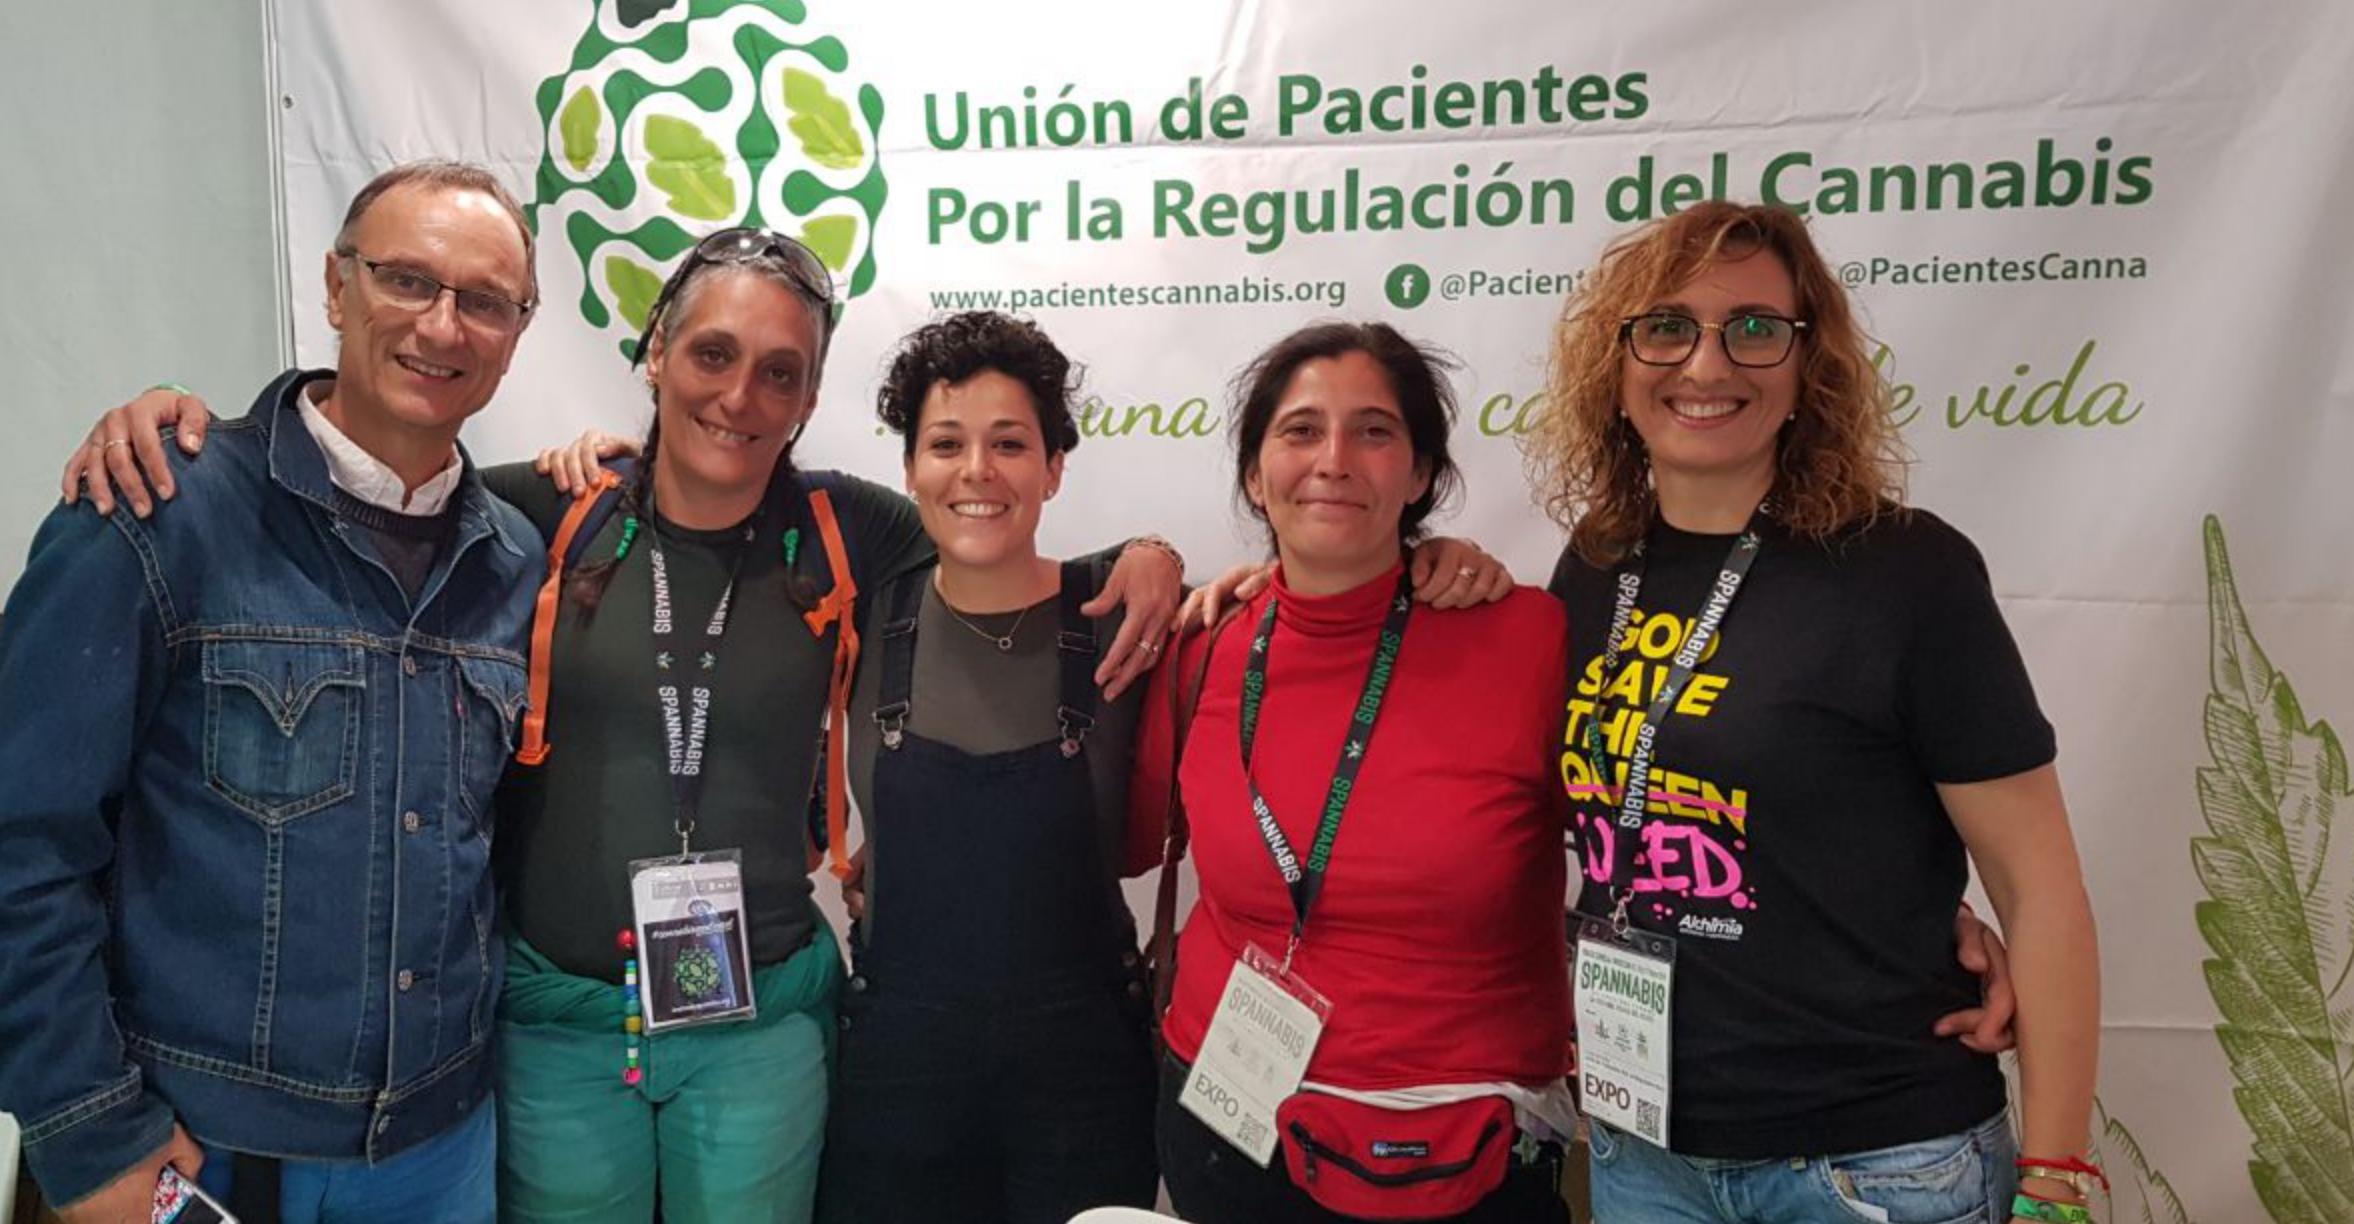 Carlos, Gisela, Sandra, Elena en Spannabis 2019 (marzo 2019)